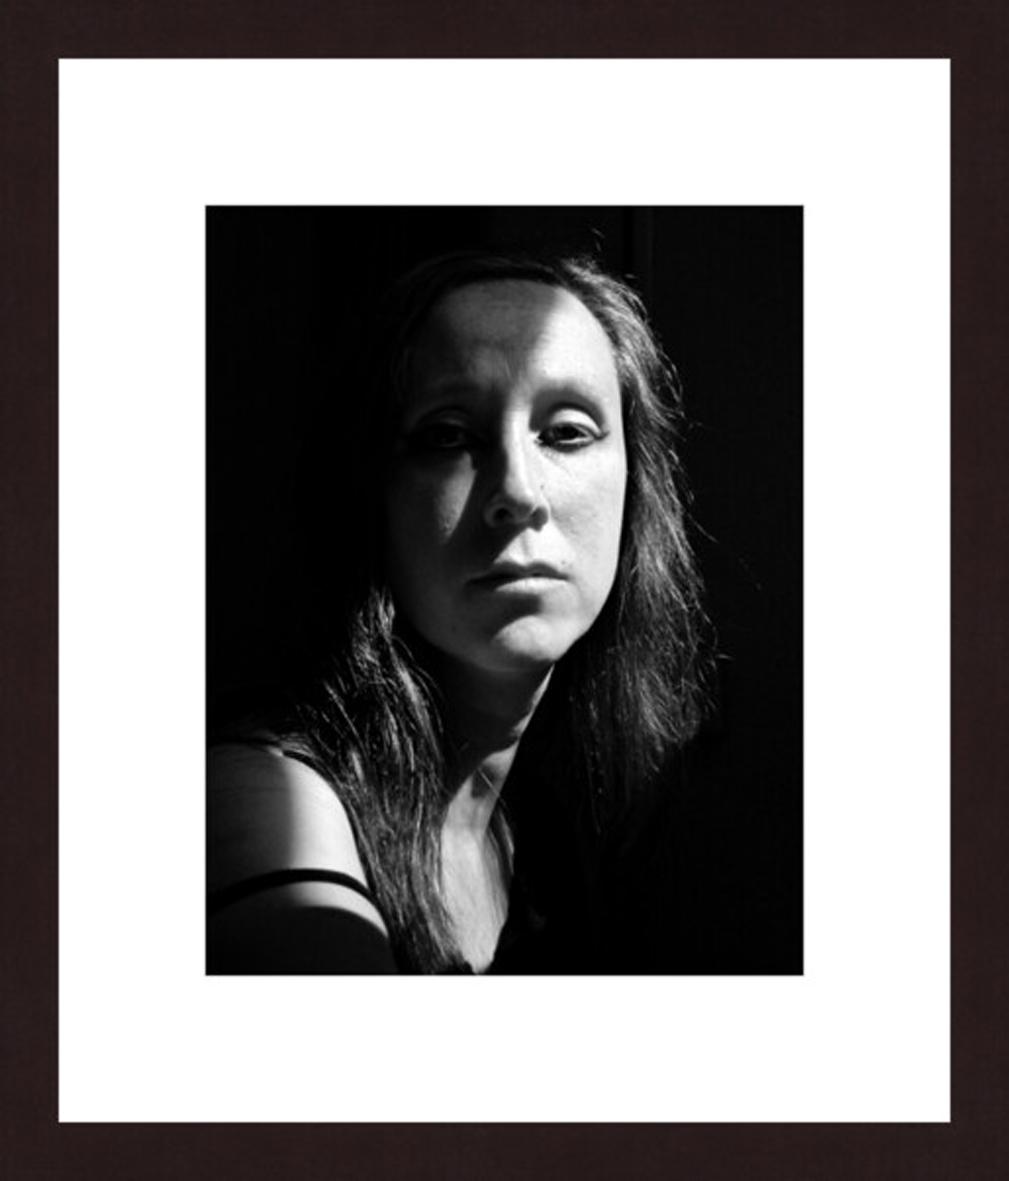 Self-portrait 07 04 27